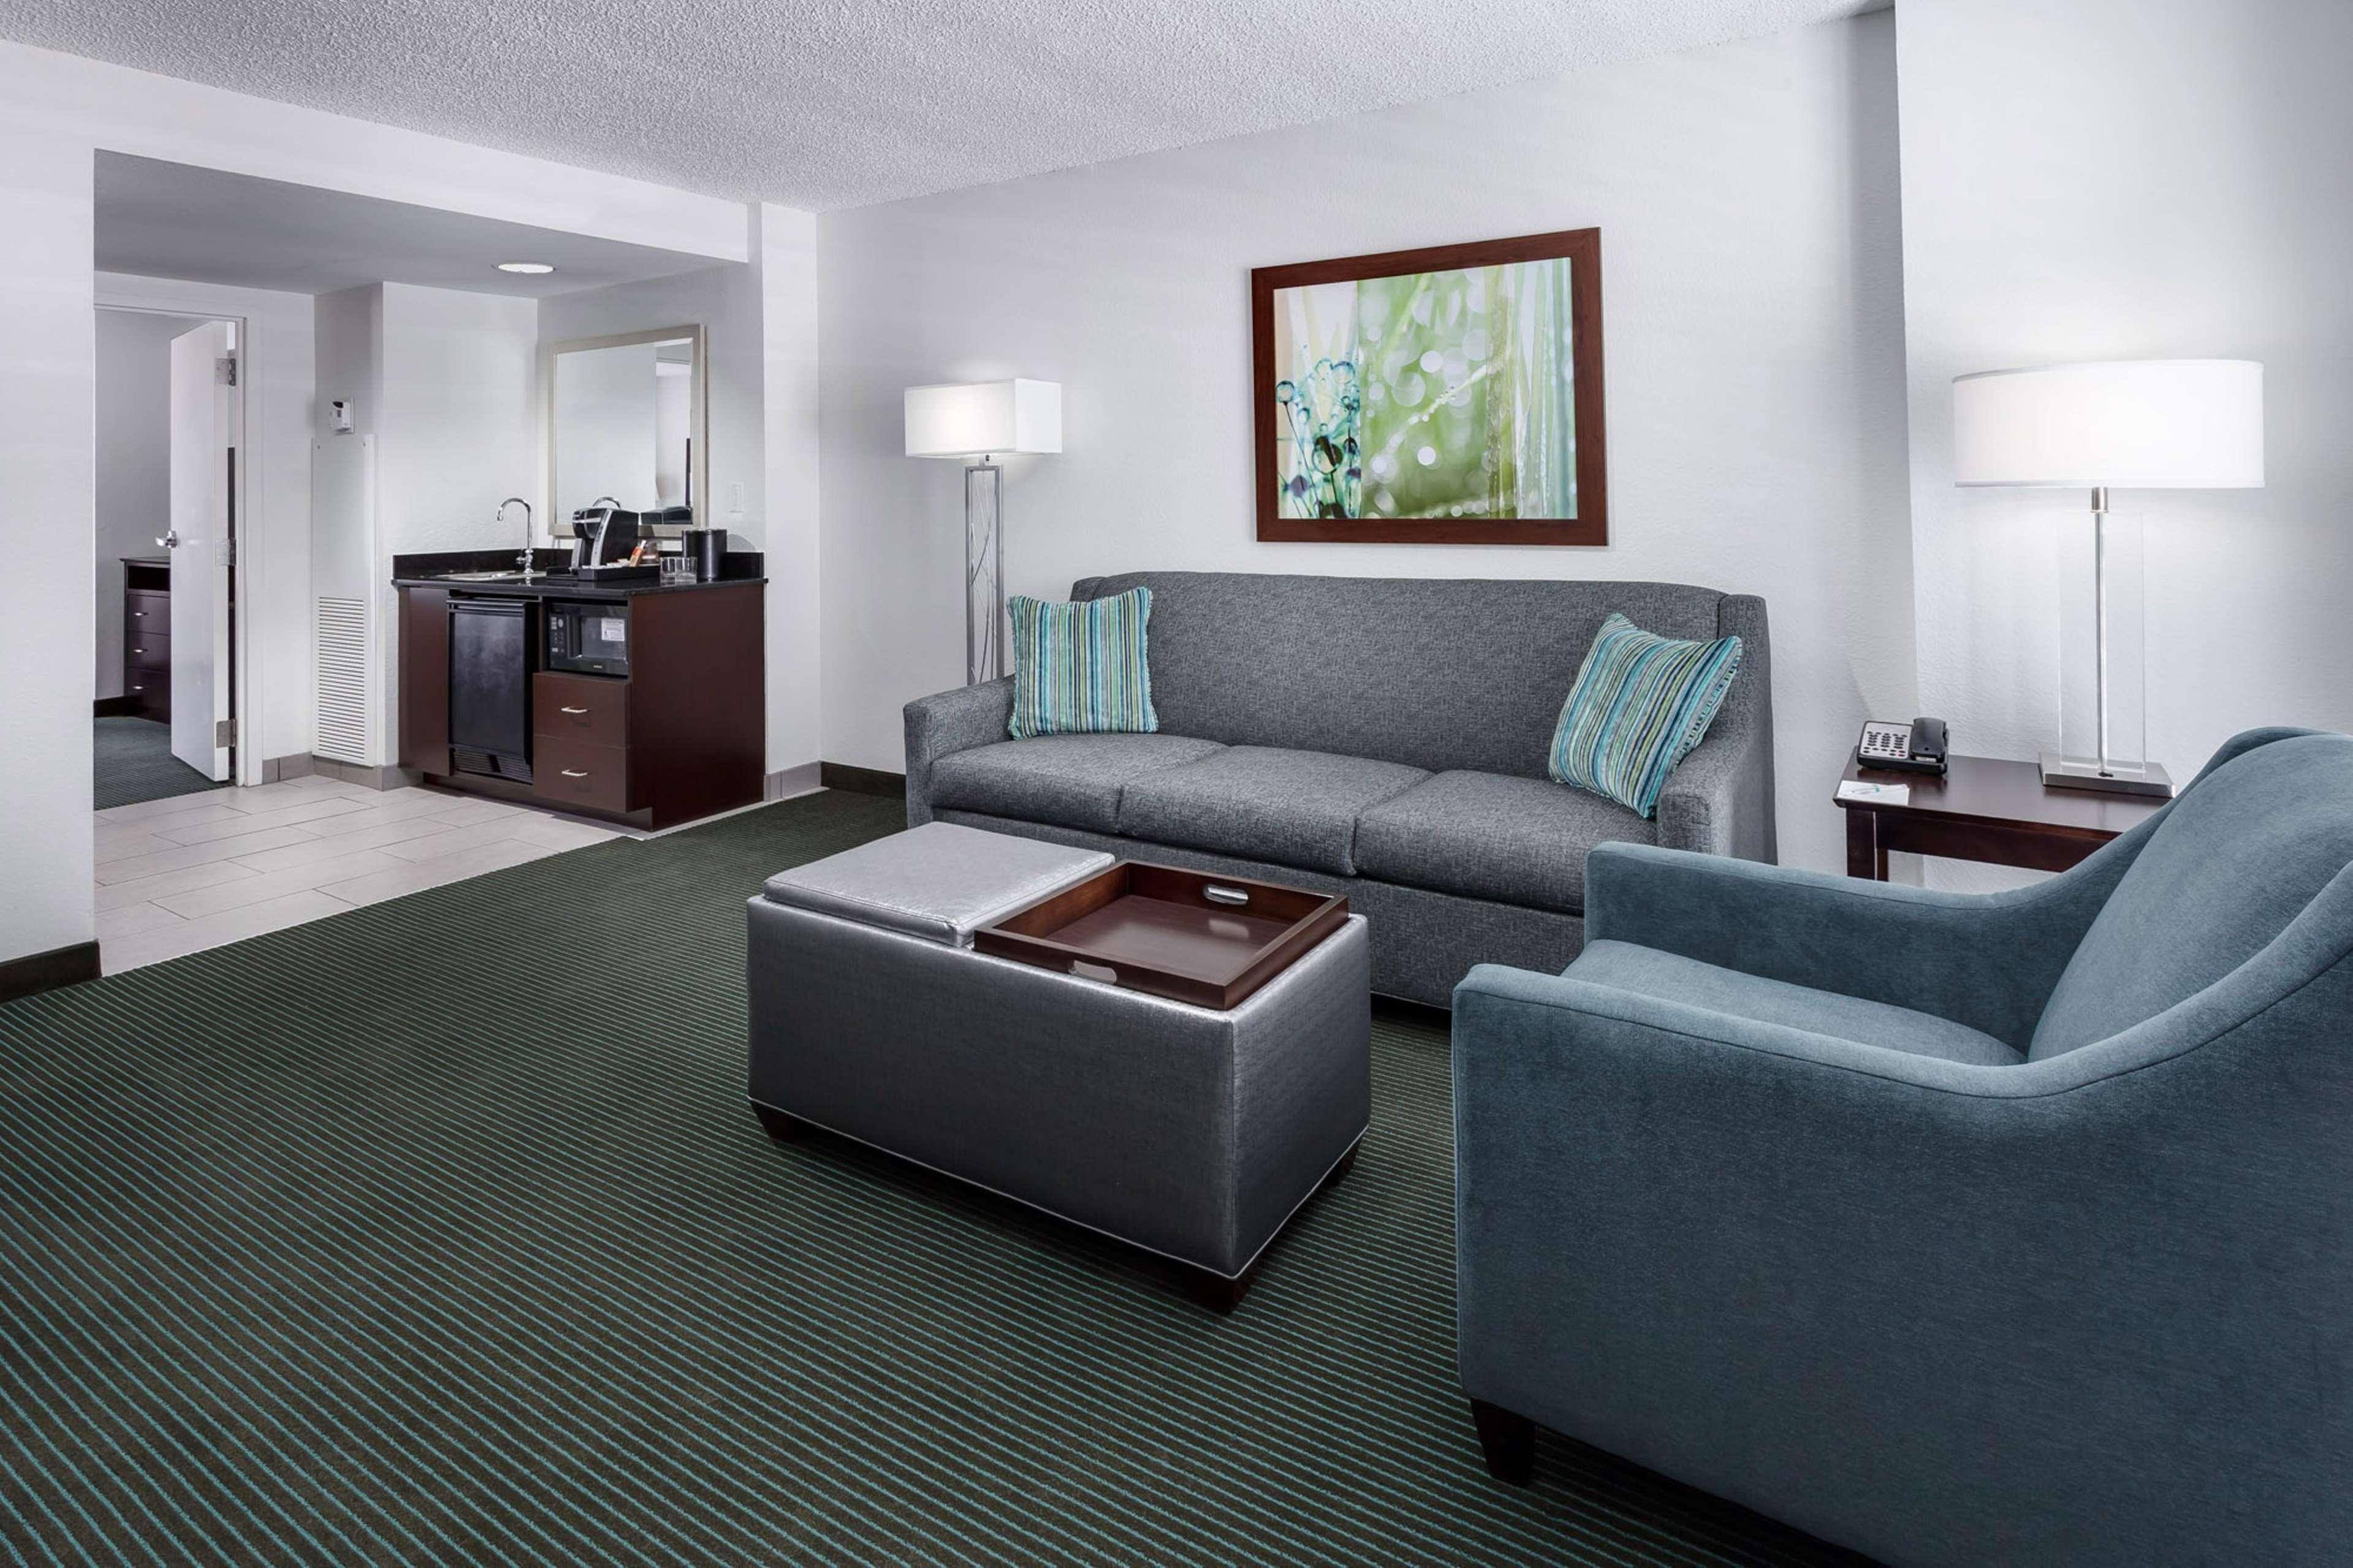 Embassy Suites by Hilton Orlando Lake Buena Vista Resort image 19